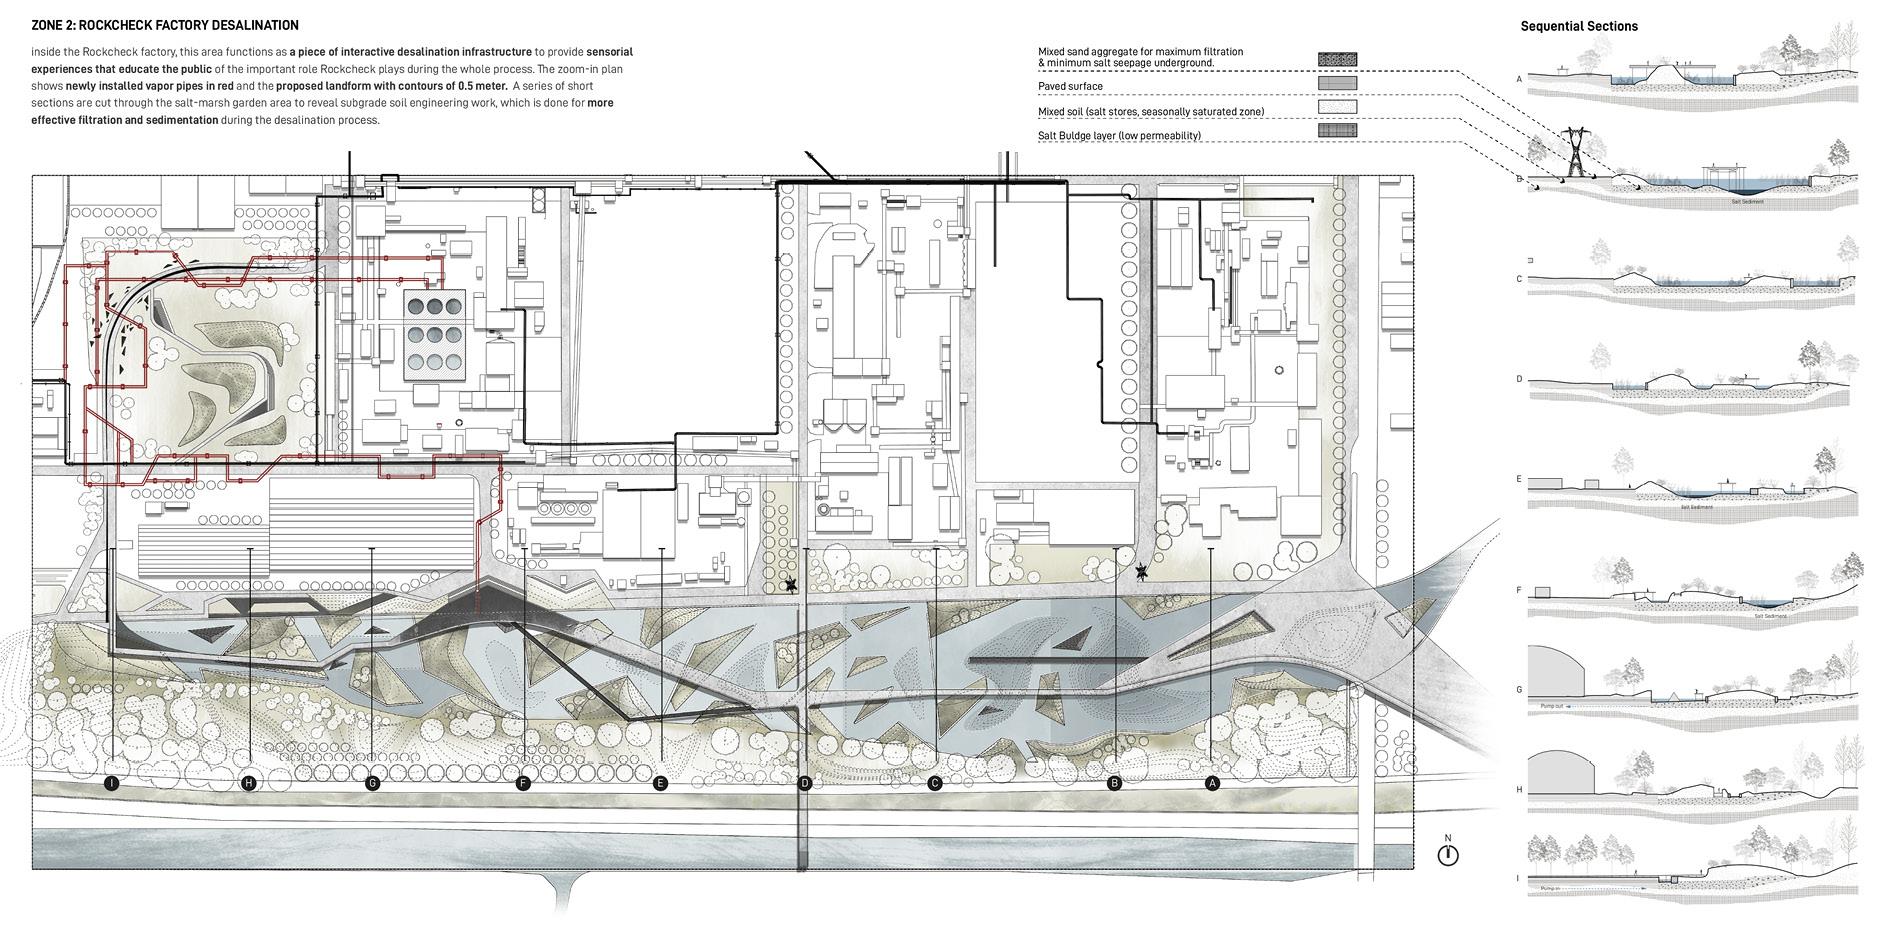 Zone 2: Rockcheck Desalination Garden